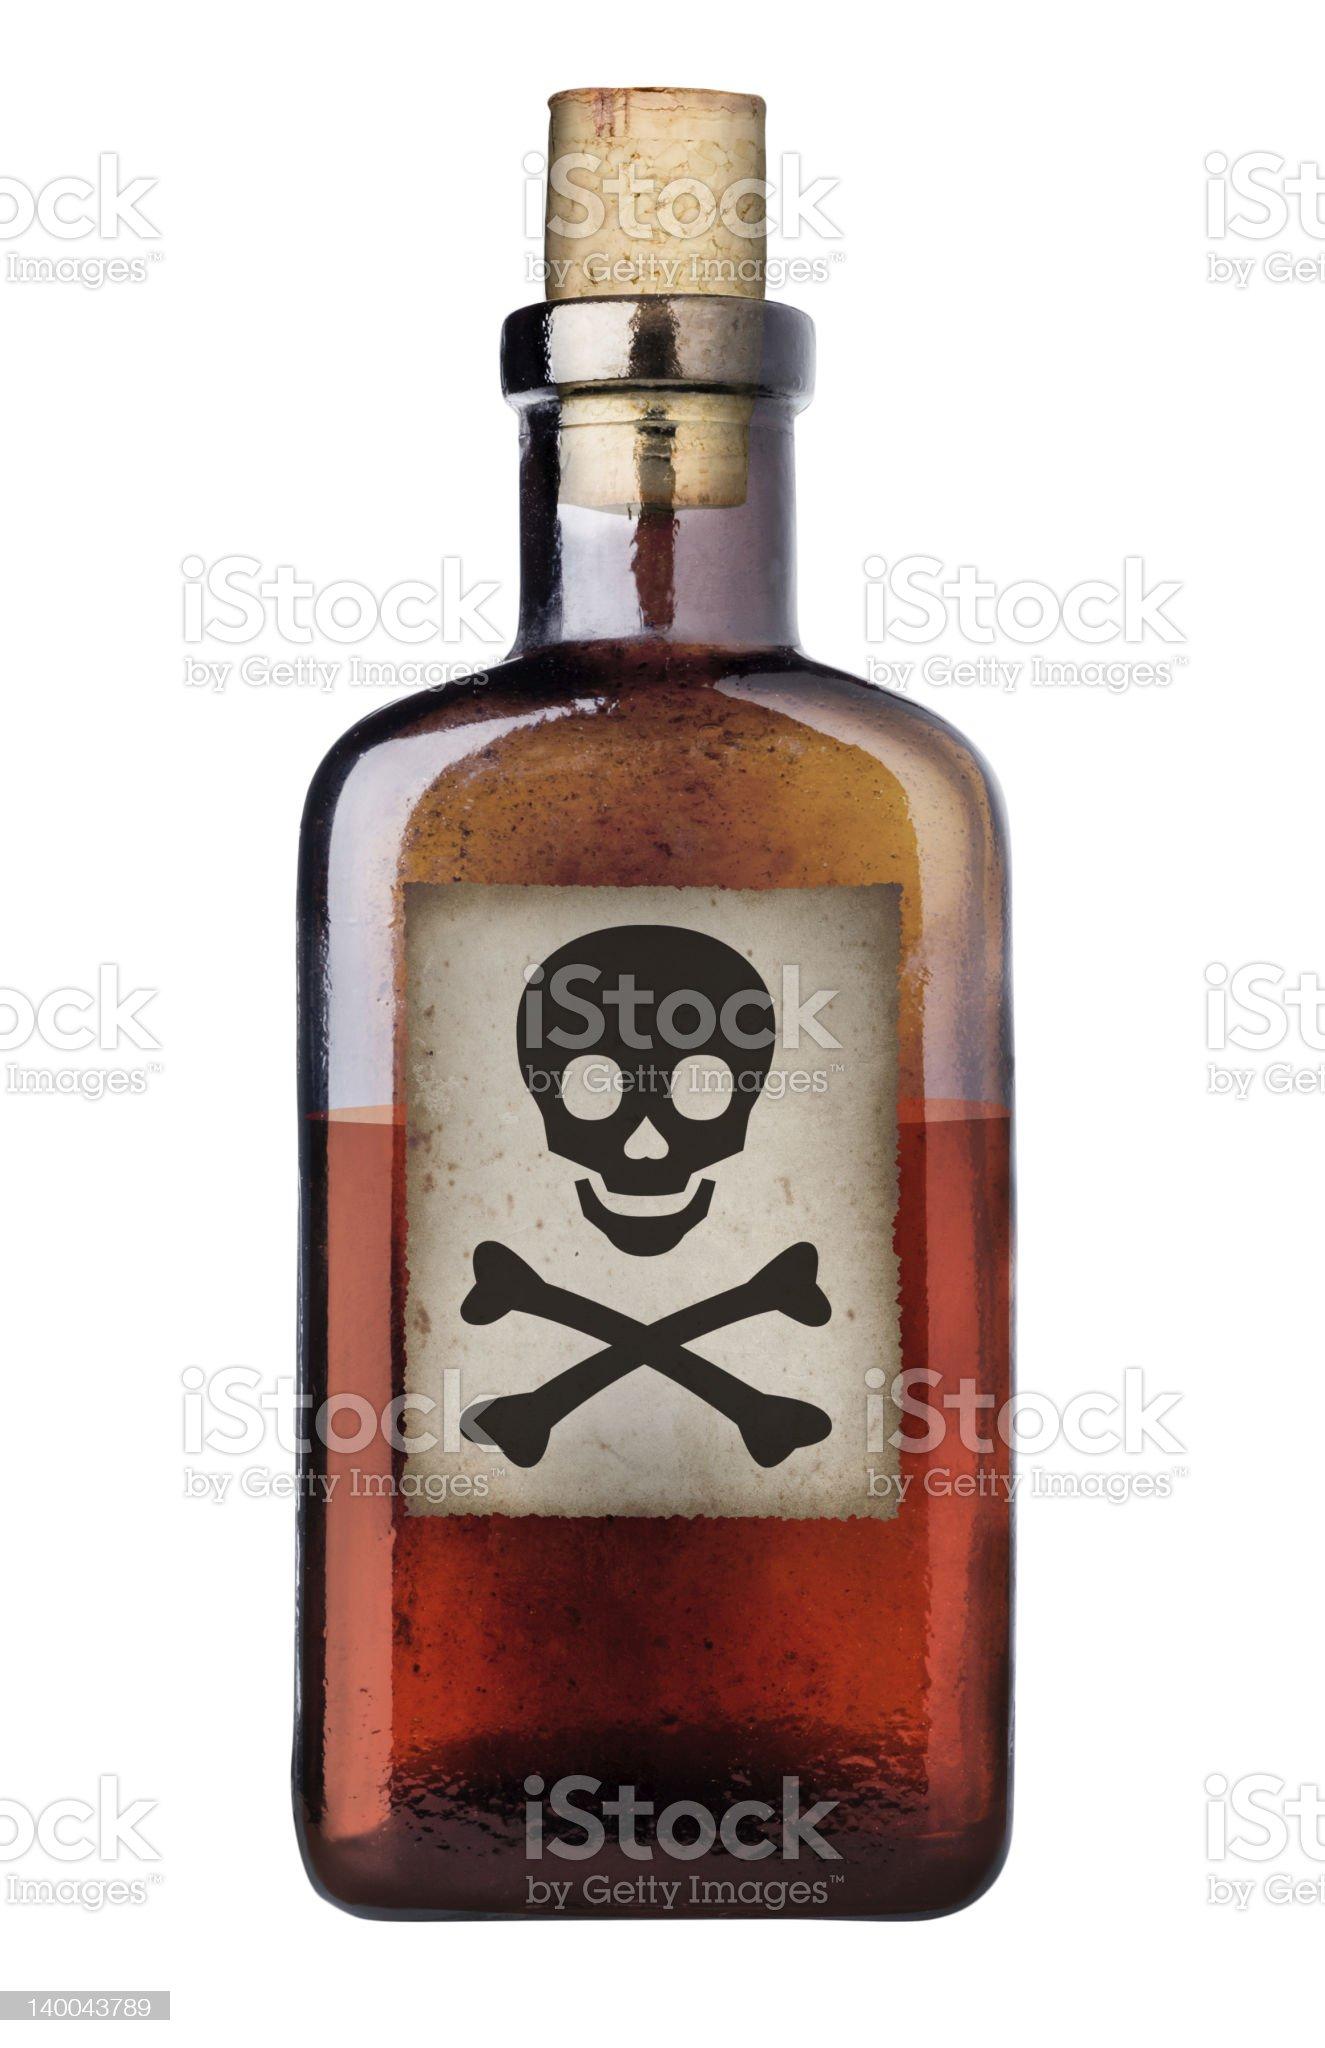 Old fashioned poison bottle. royalty-free stock photo